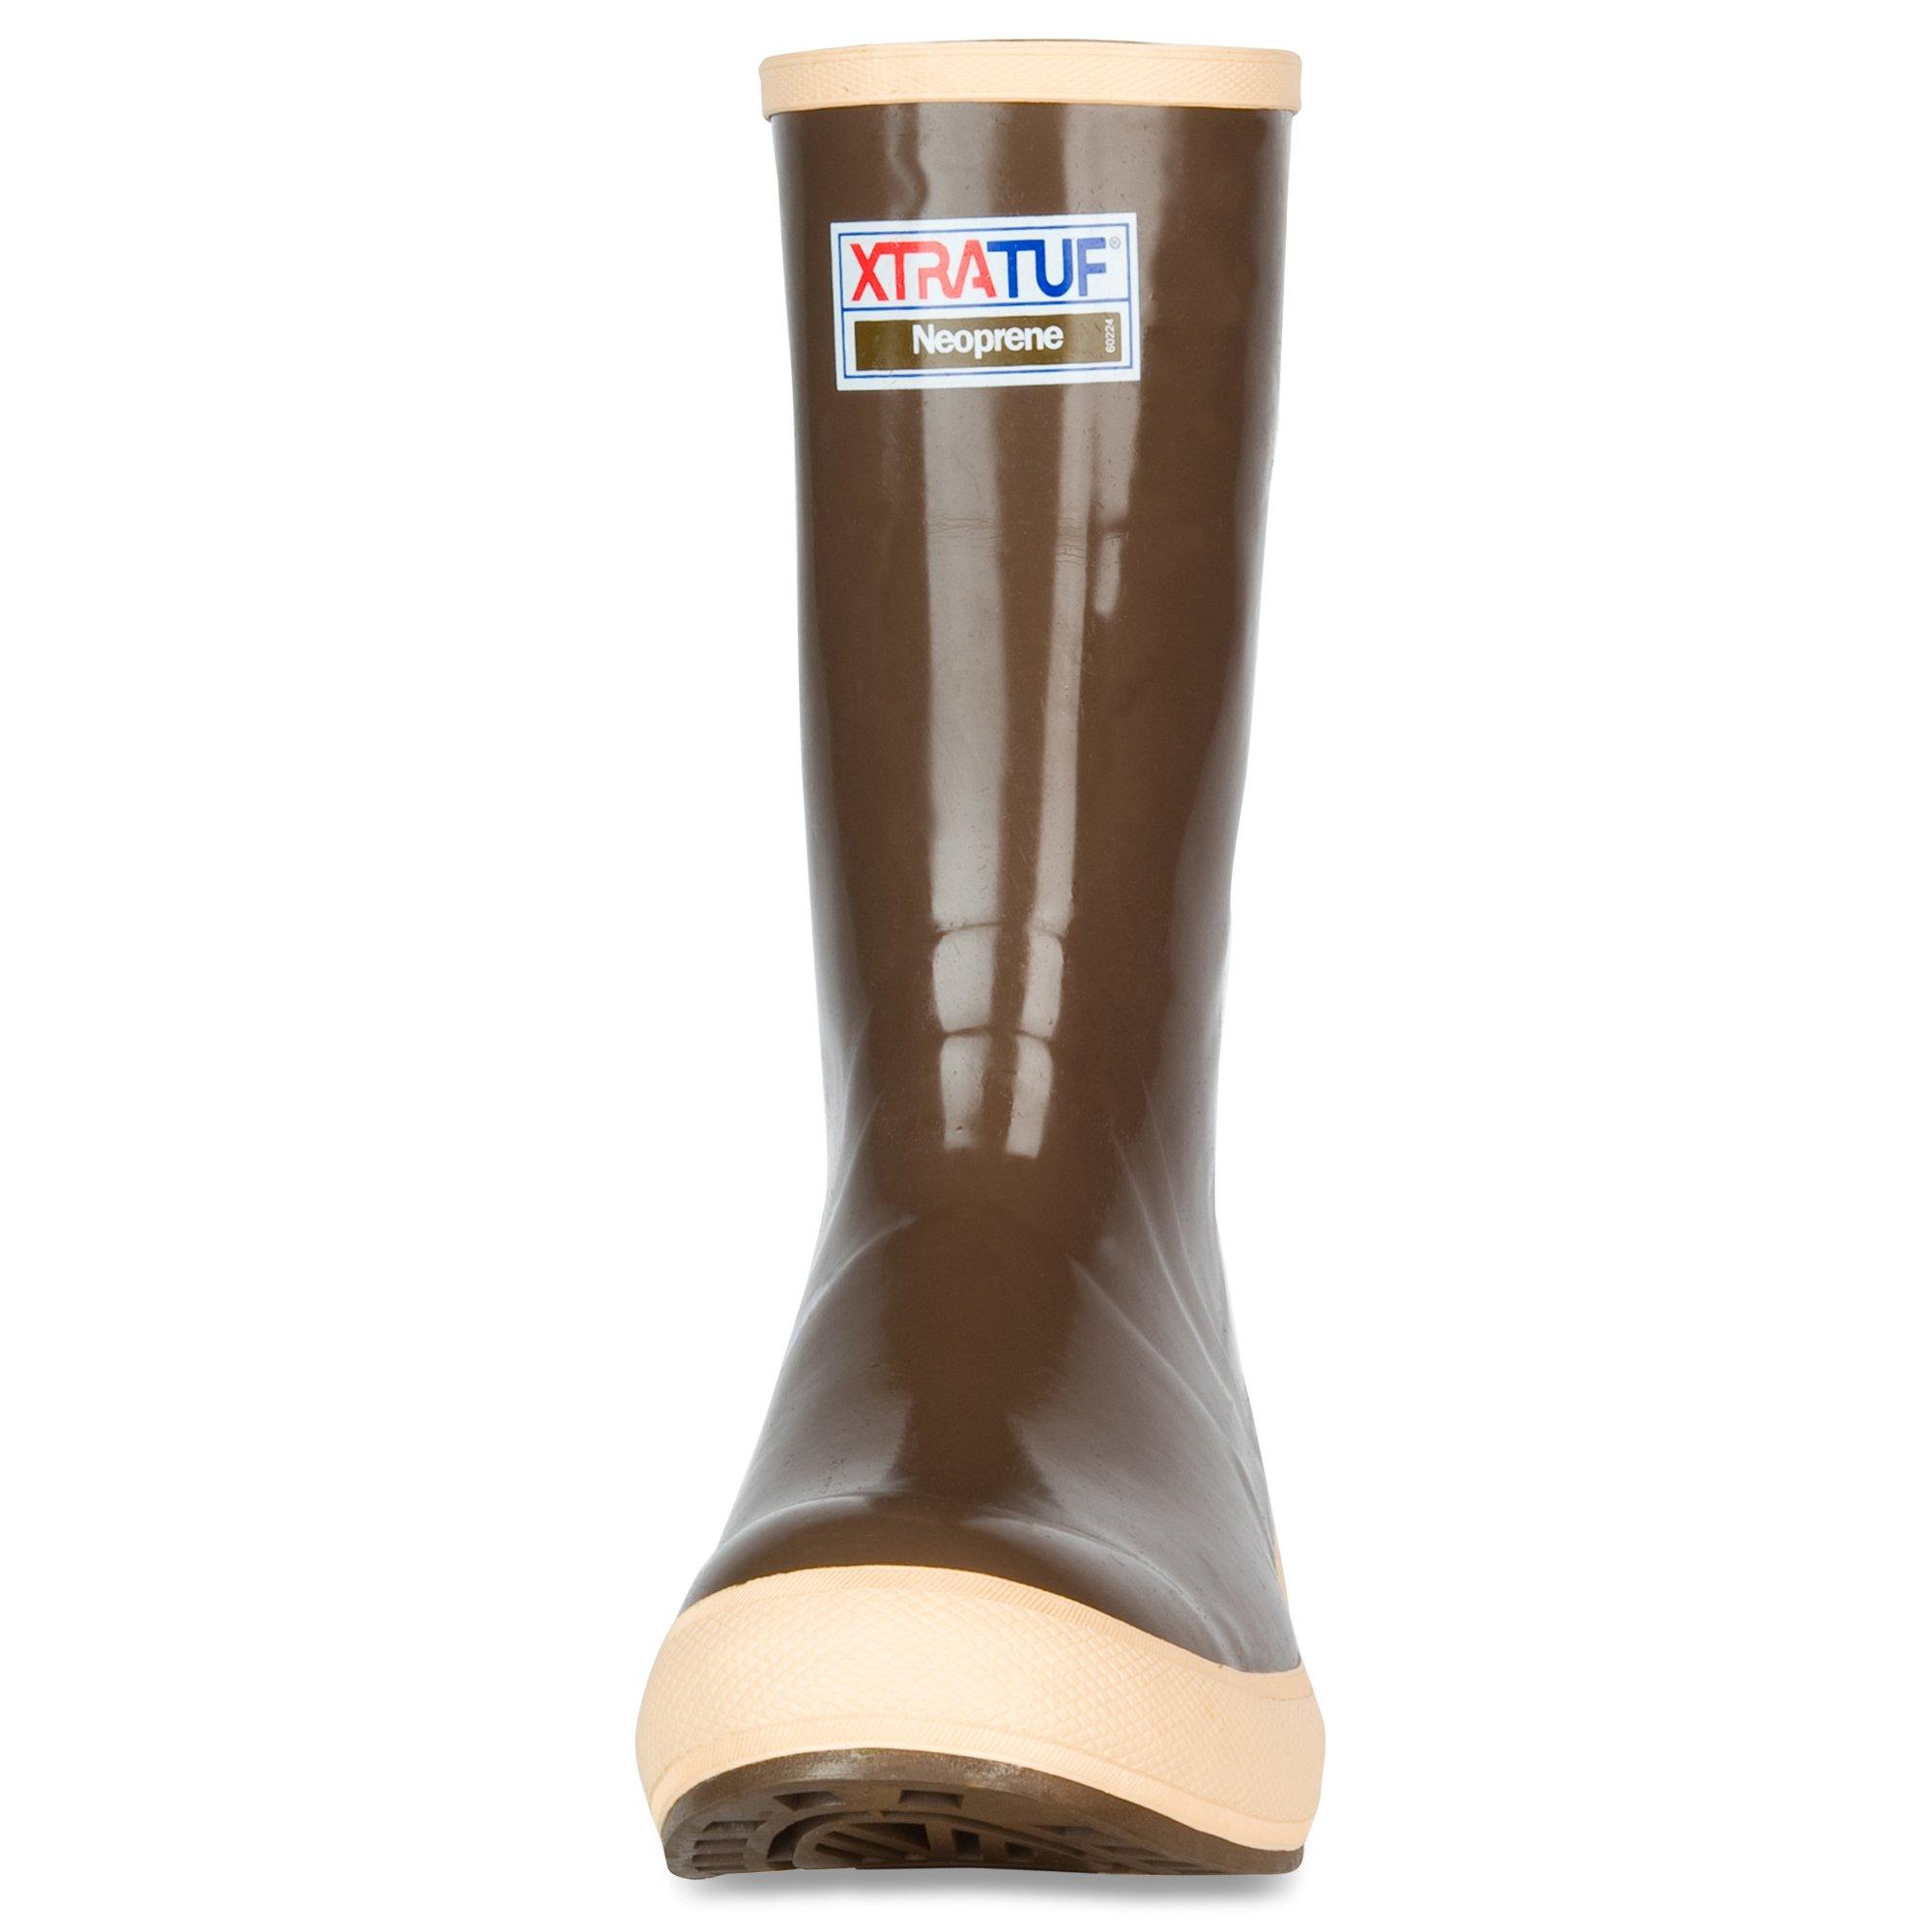 XTRATUF Legacy Series 12'' Camo-Lined Neoprene Men's Fishing Boots, Copper & Tan (22834G) by Xtratuf (Image #2)